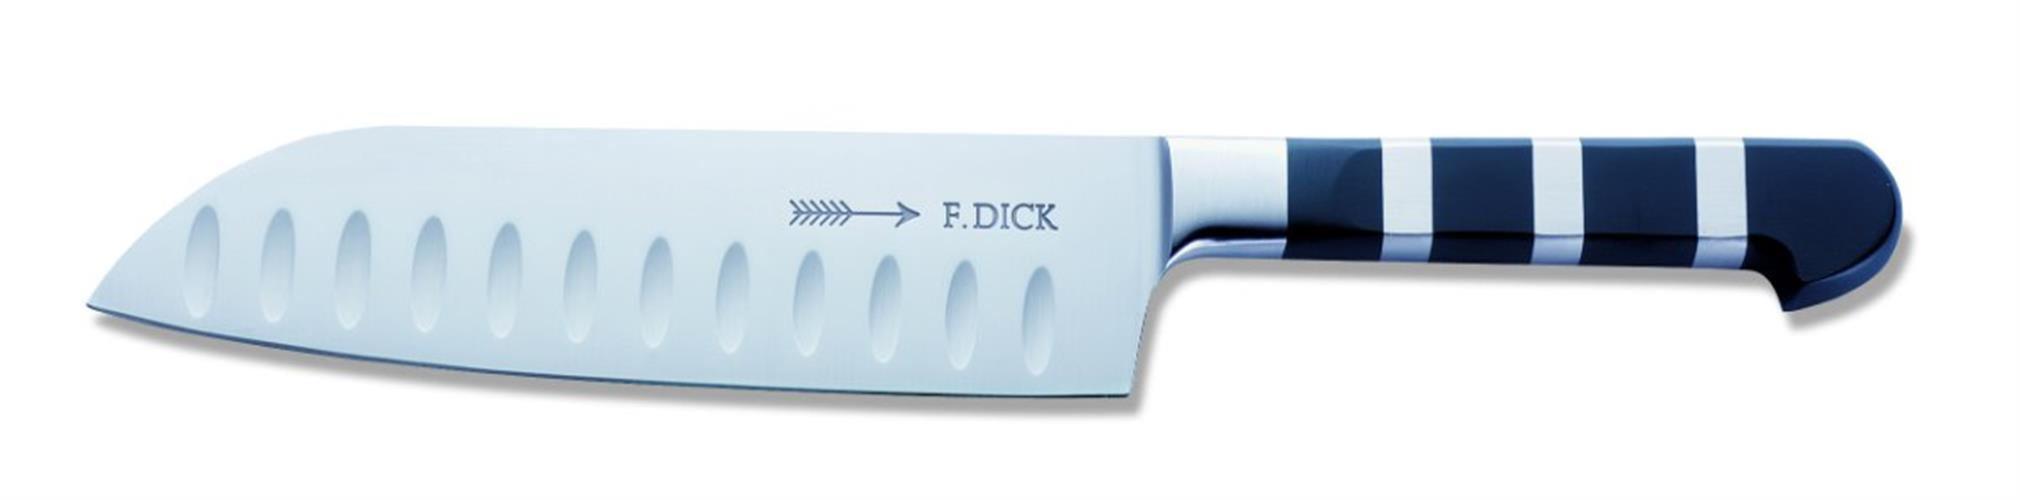 "סכין סנטוקו חריצים 18 ס""מ | DICK | 1905"